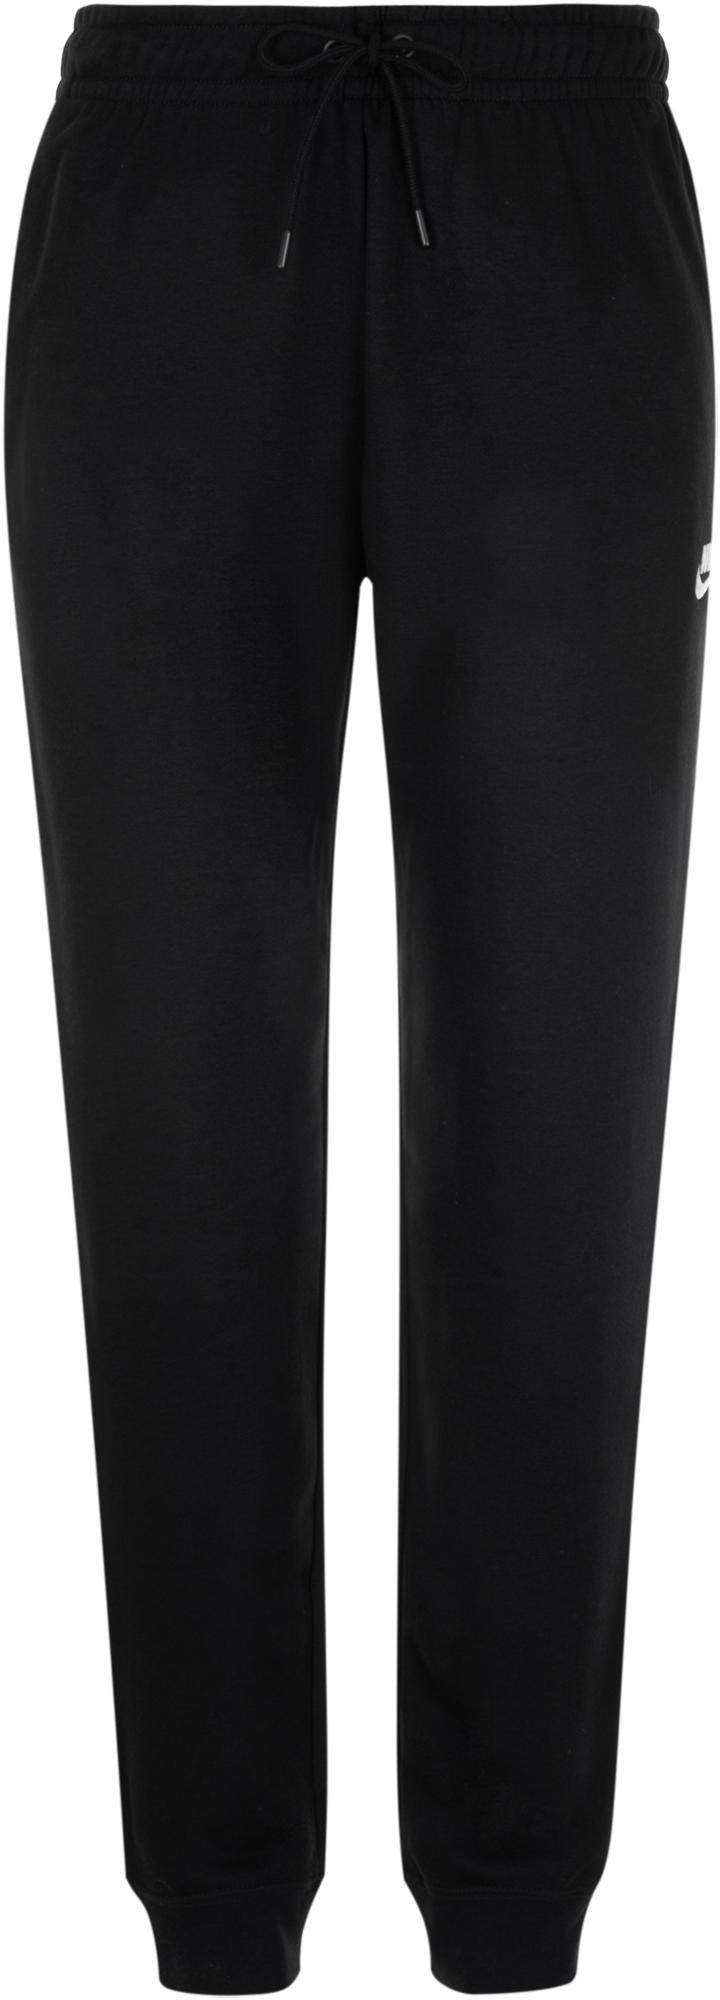 Nike Брюки женские Nike Sportswear Essential, размер 48-50 леггинсы женские nike sportswear leggings цвет серый 883657 036 размер m 46 48